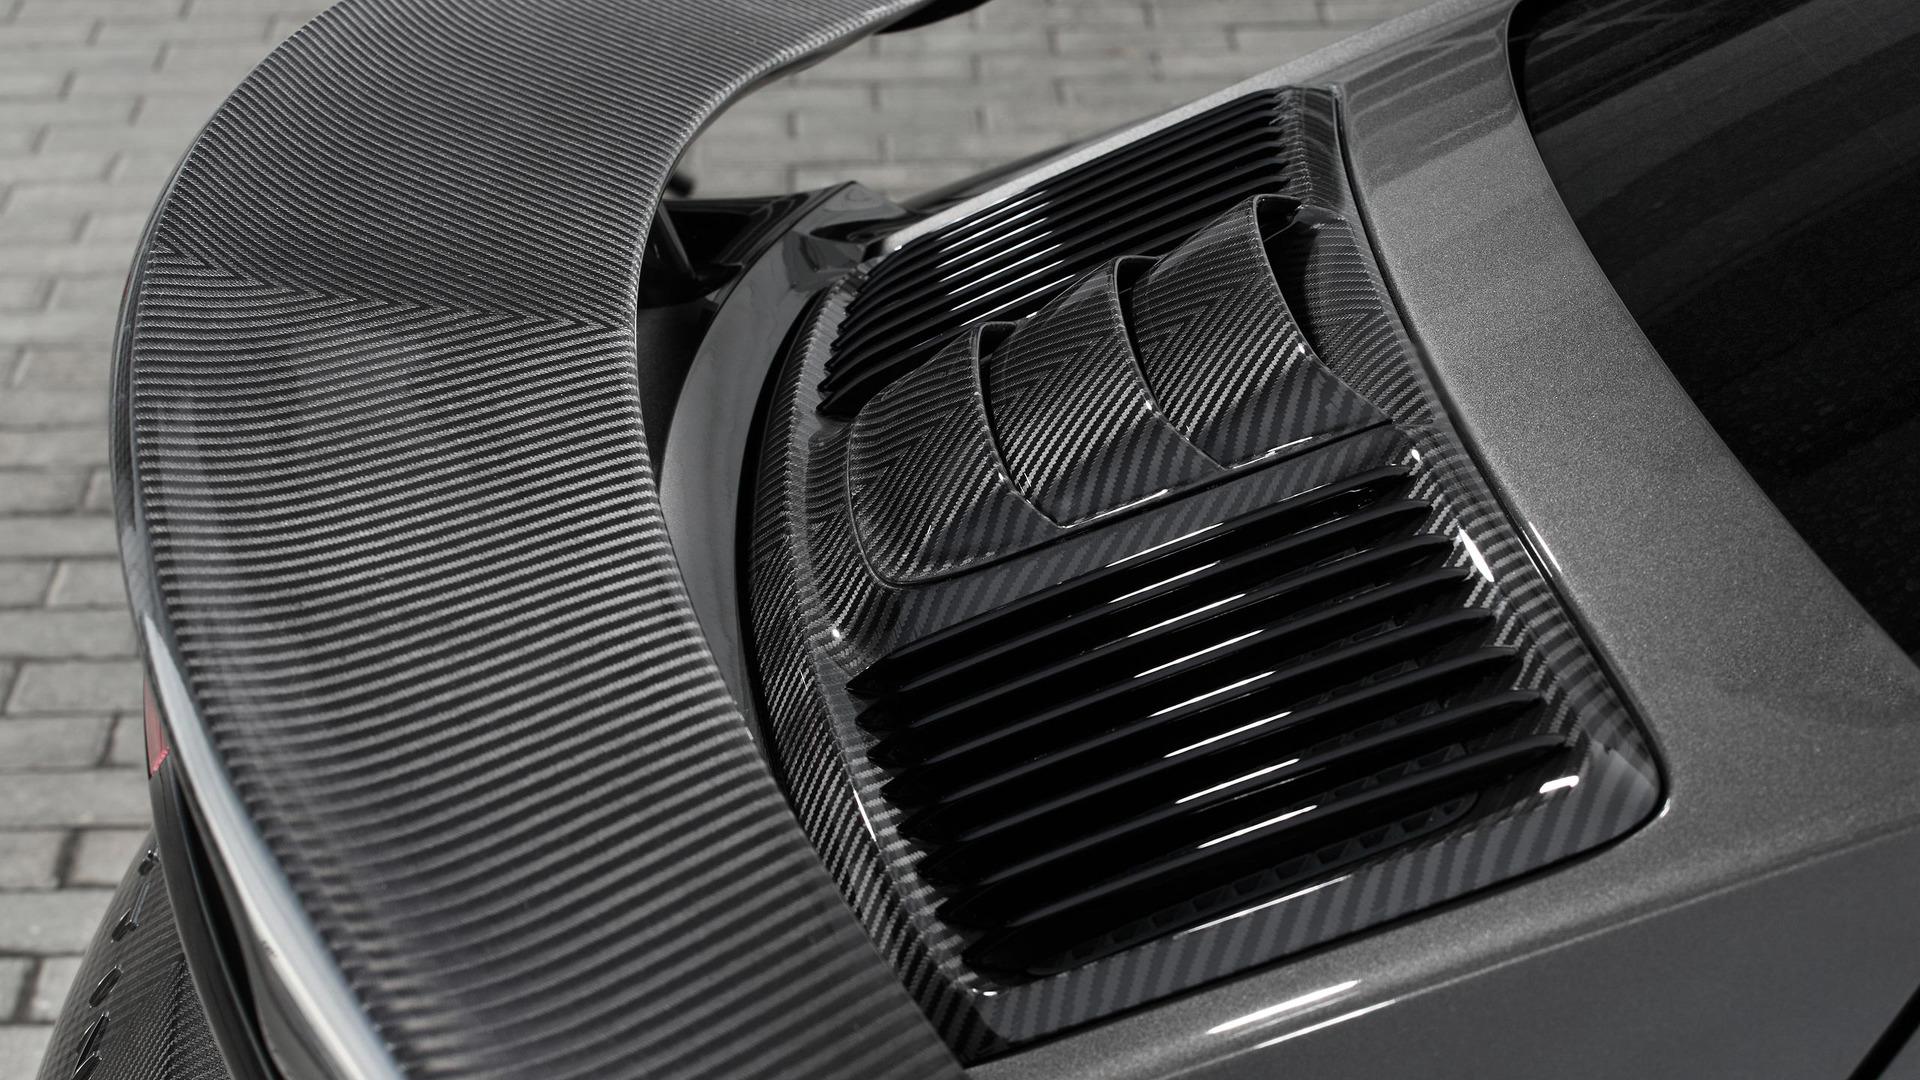 Carbon Porsche 911 Turbo Topcar (18)